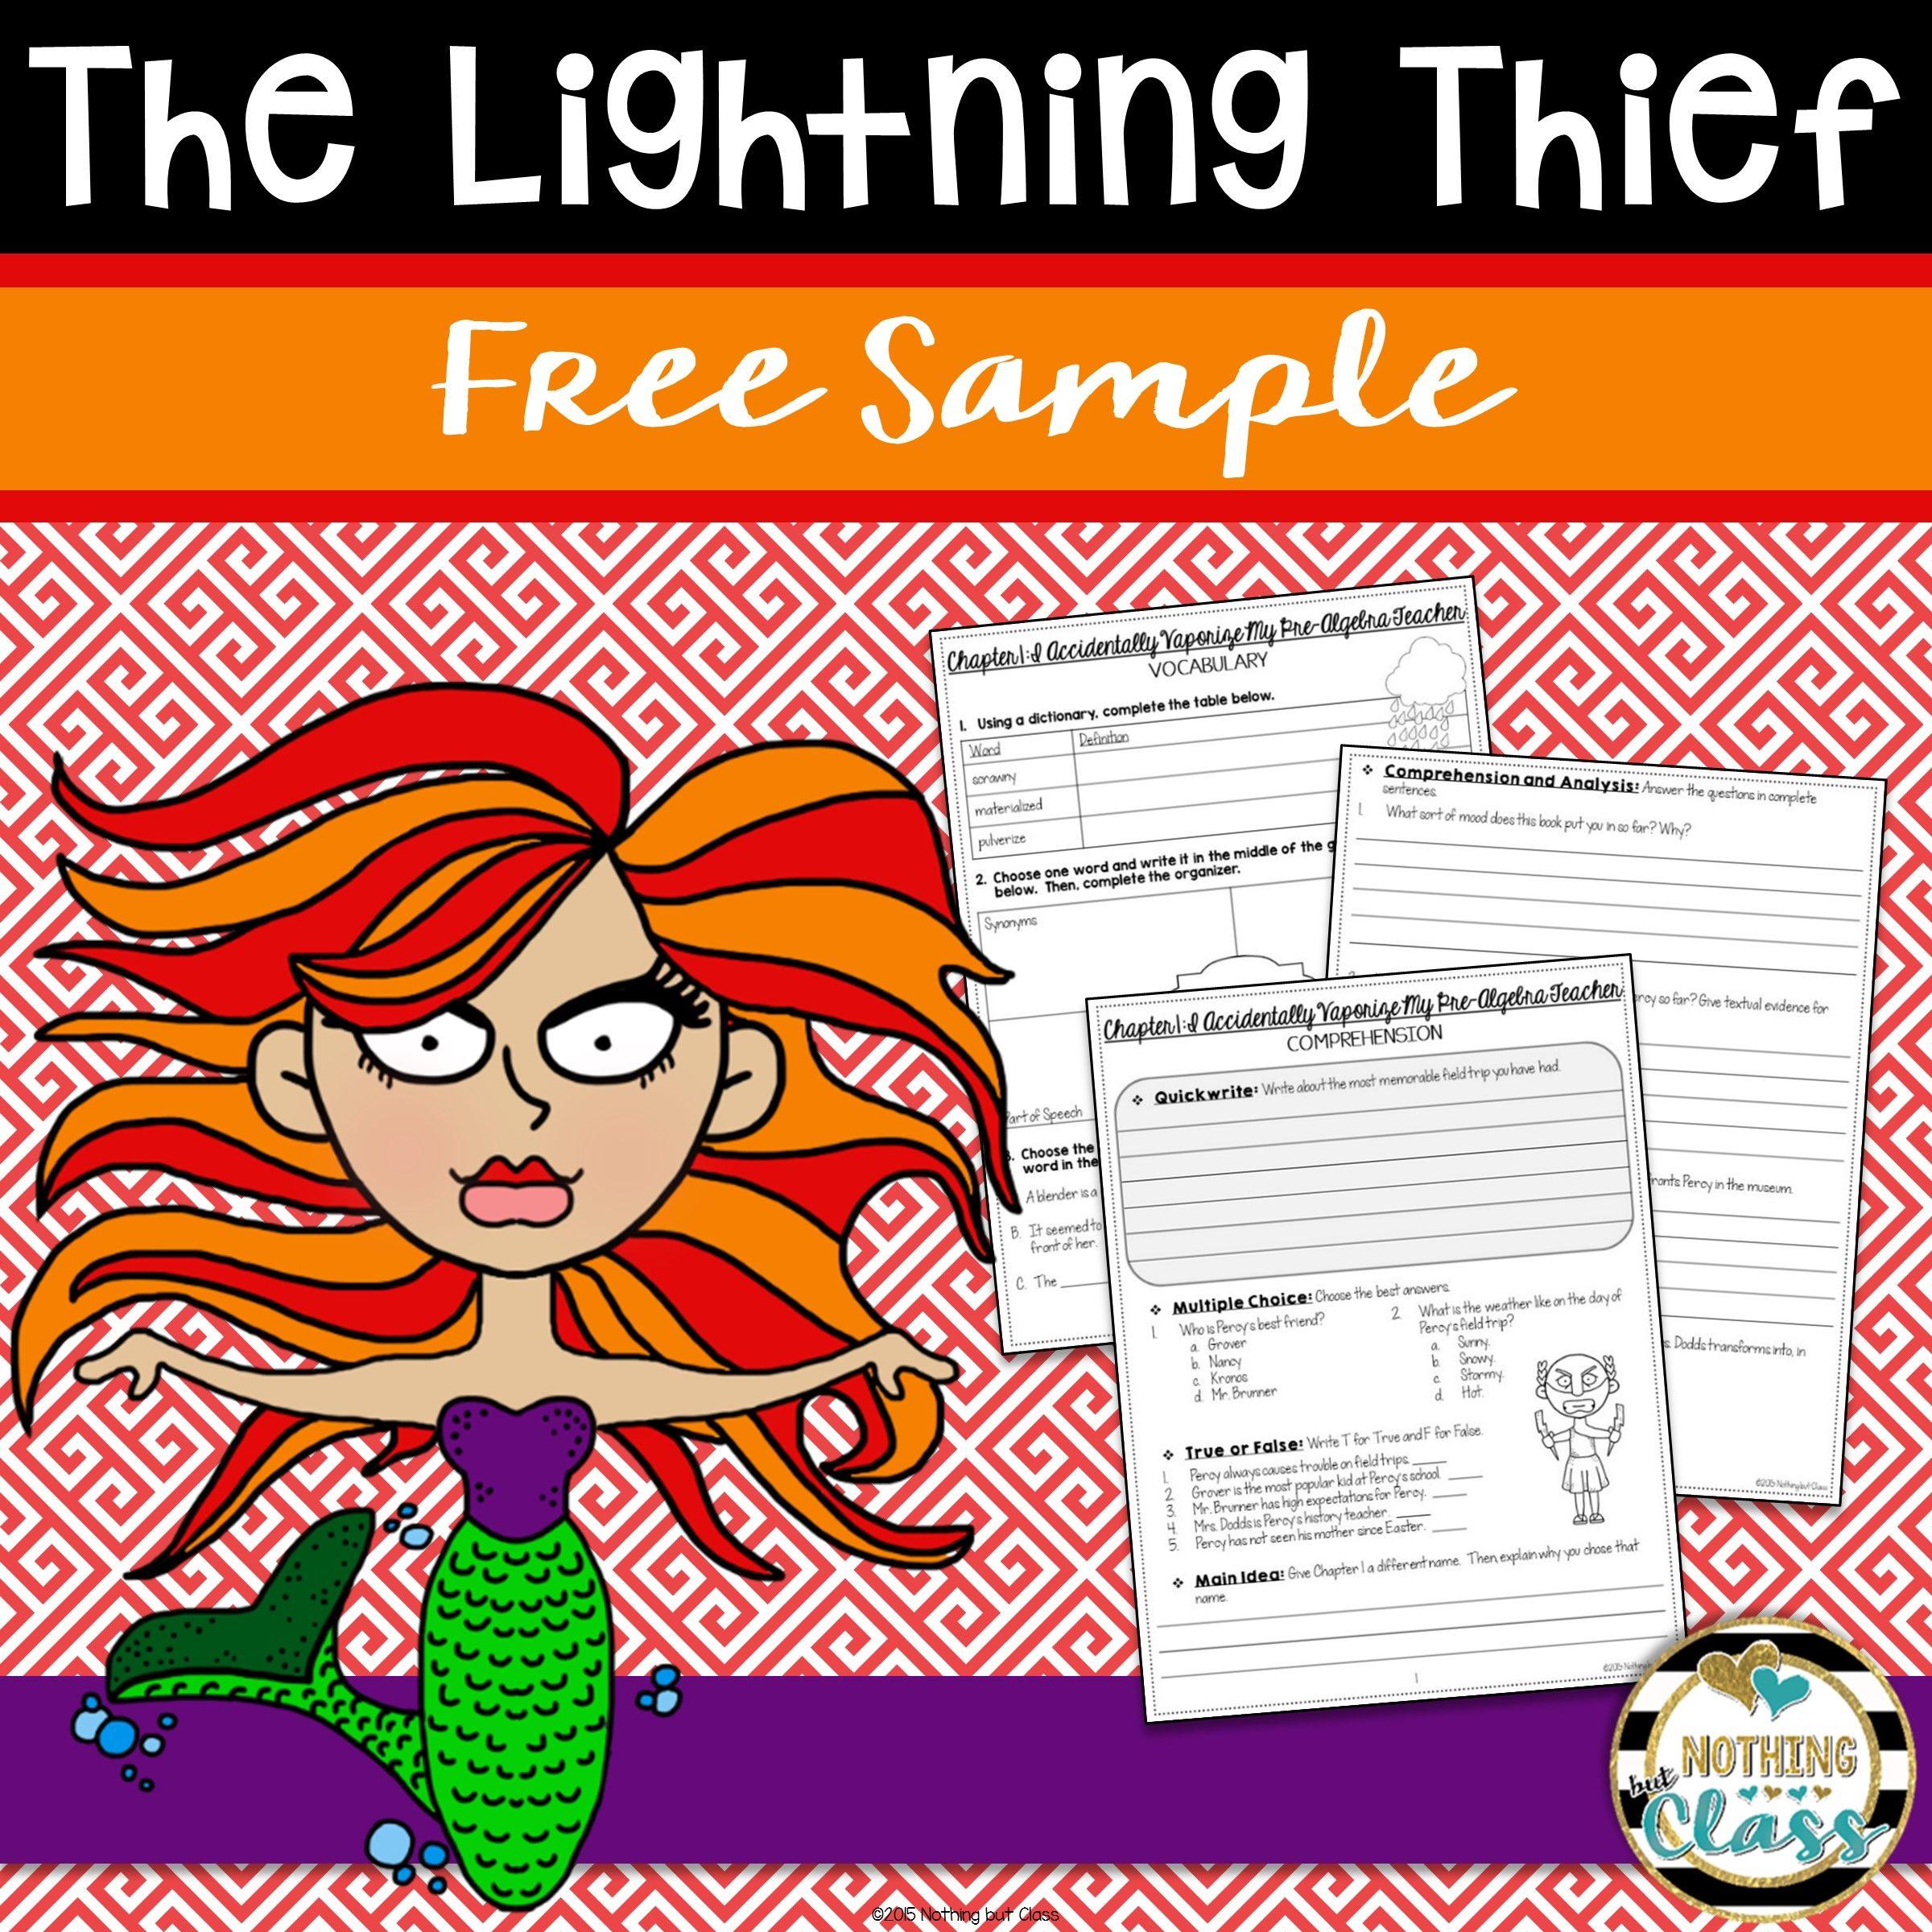 The Lightning Thief Novel Study Unit Free Sample